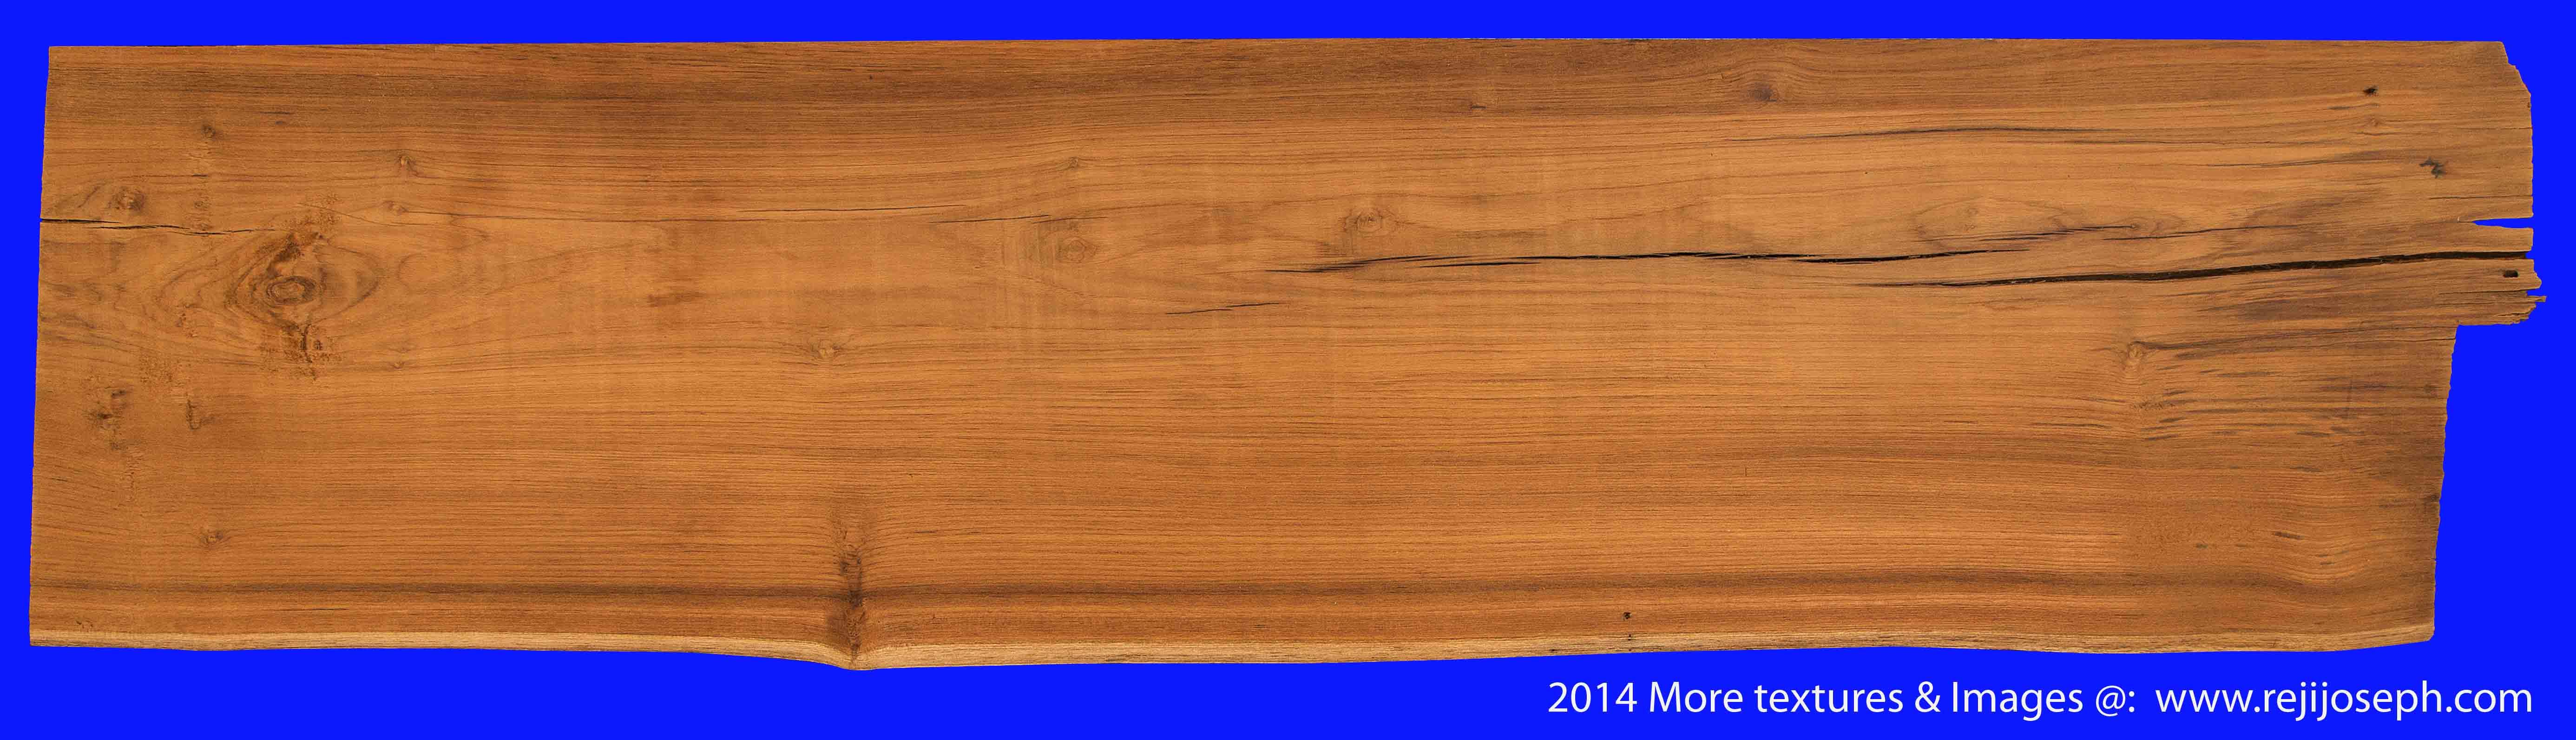 Plane Wood texture 00012